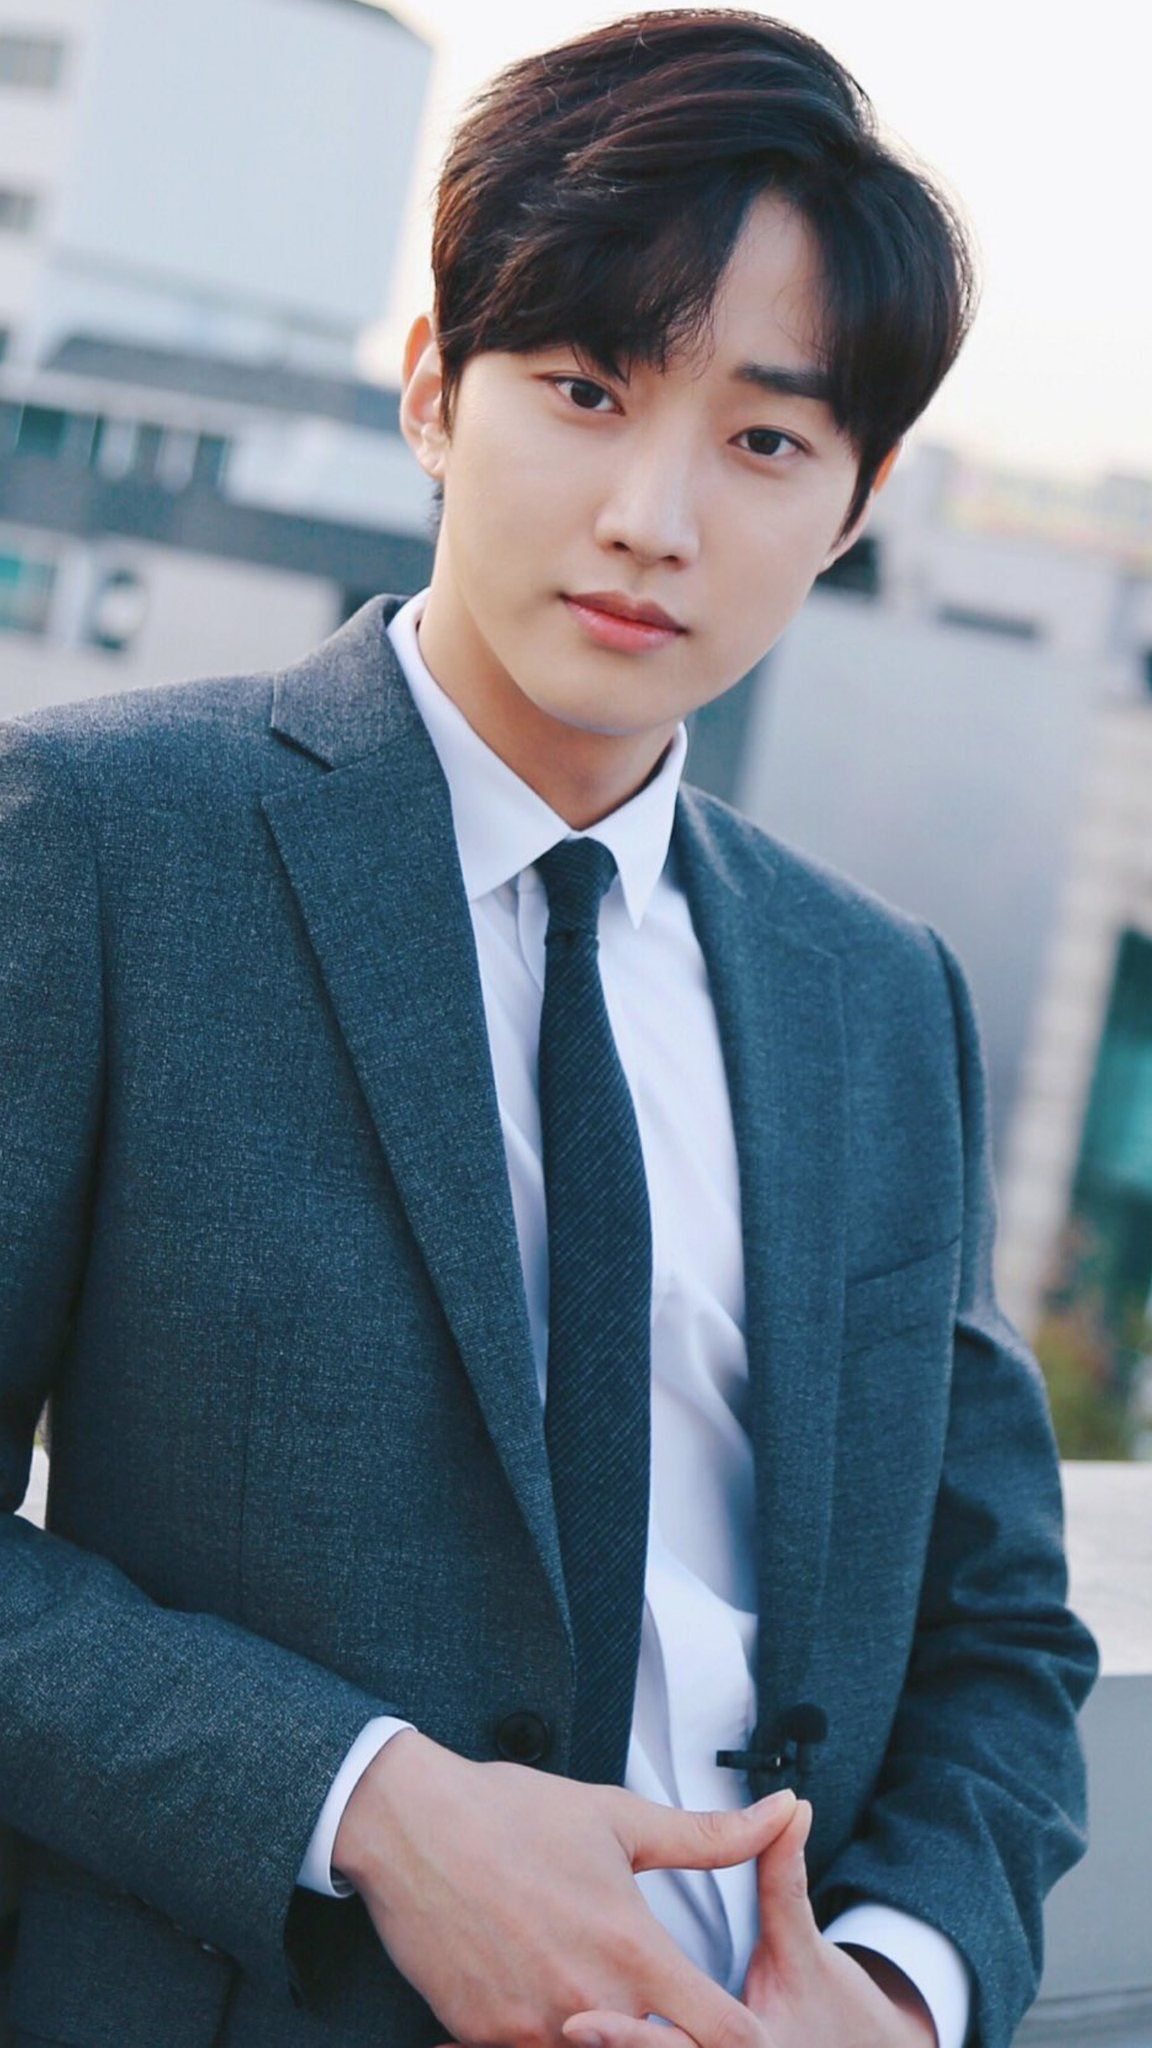 JINYOUNG - former B1A4